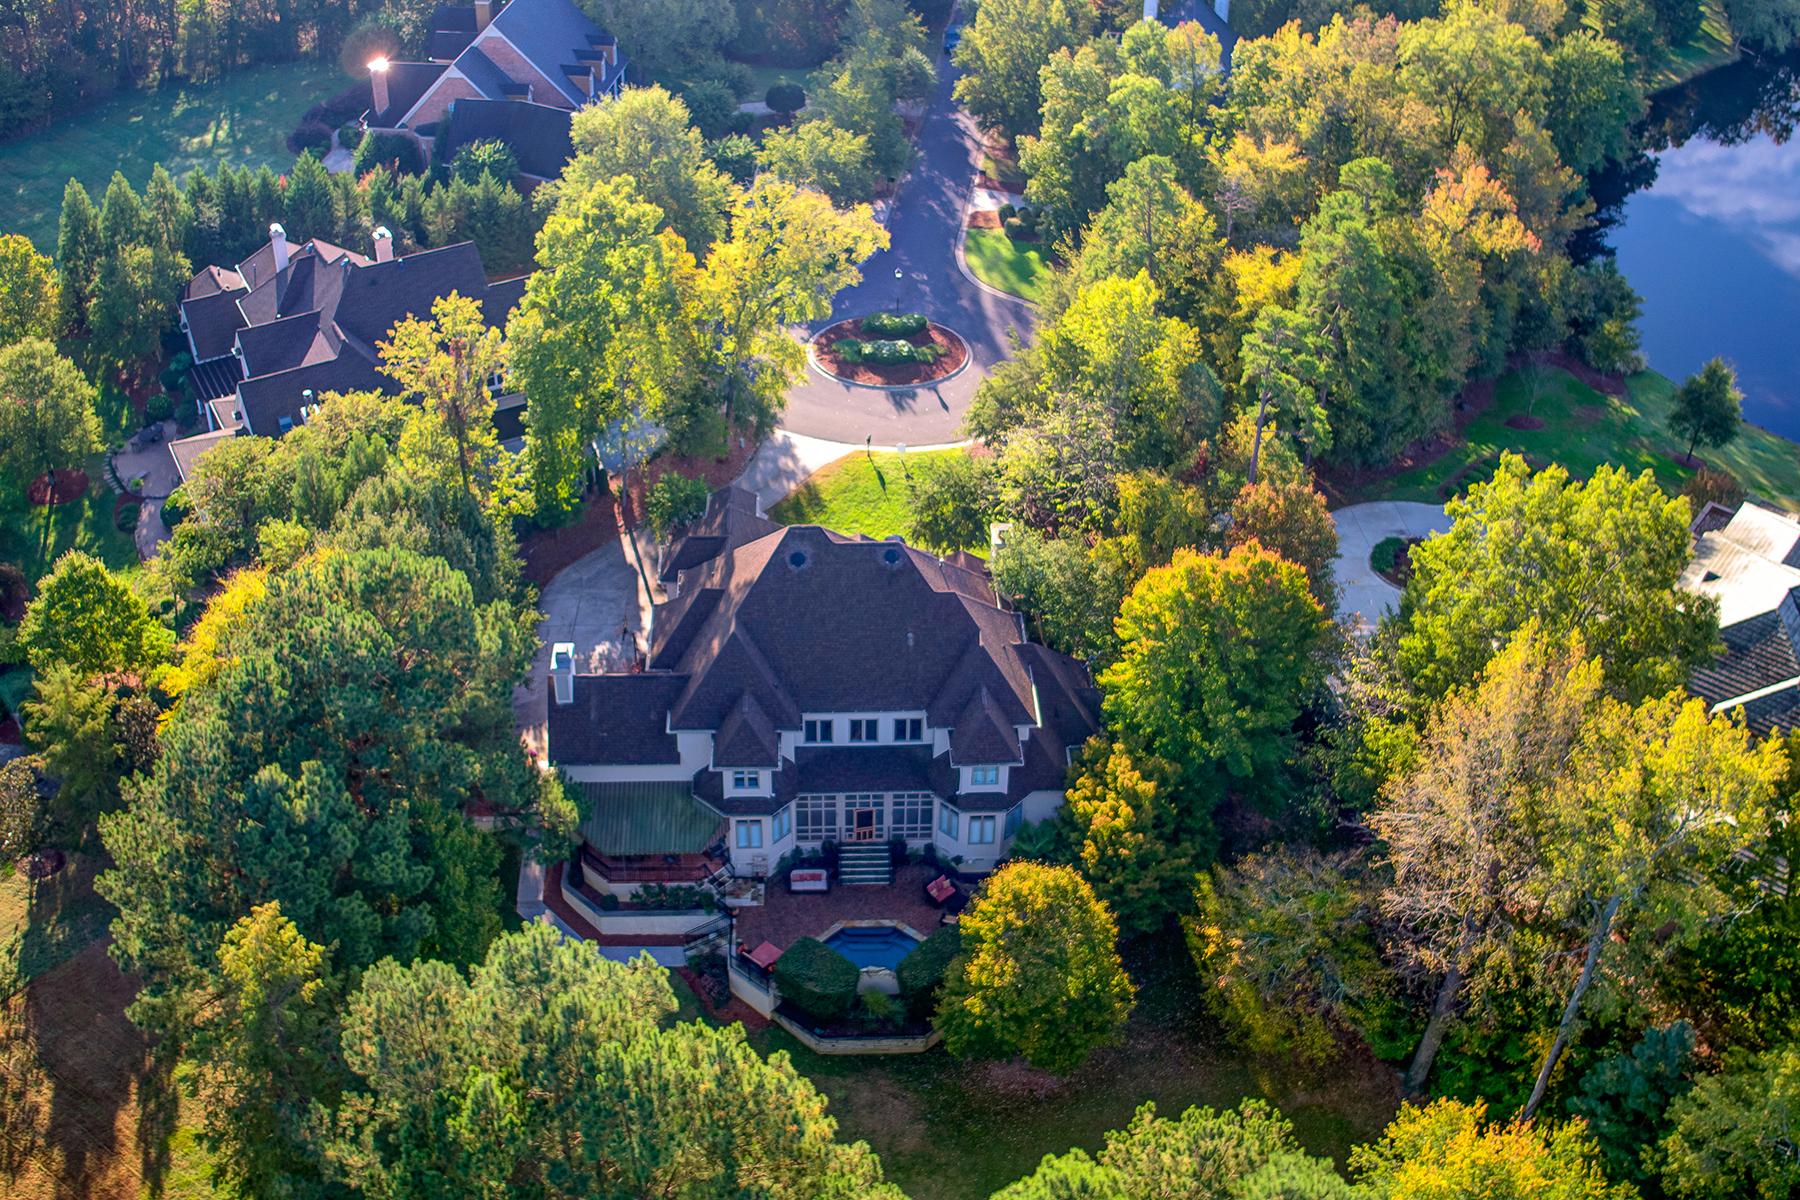 Single Family Home for Sale at PIPER GLEN 7924 Kieldon Ct 3 Charlotte, North Carolina, 28277 United States